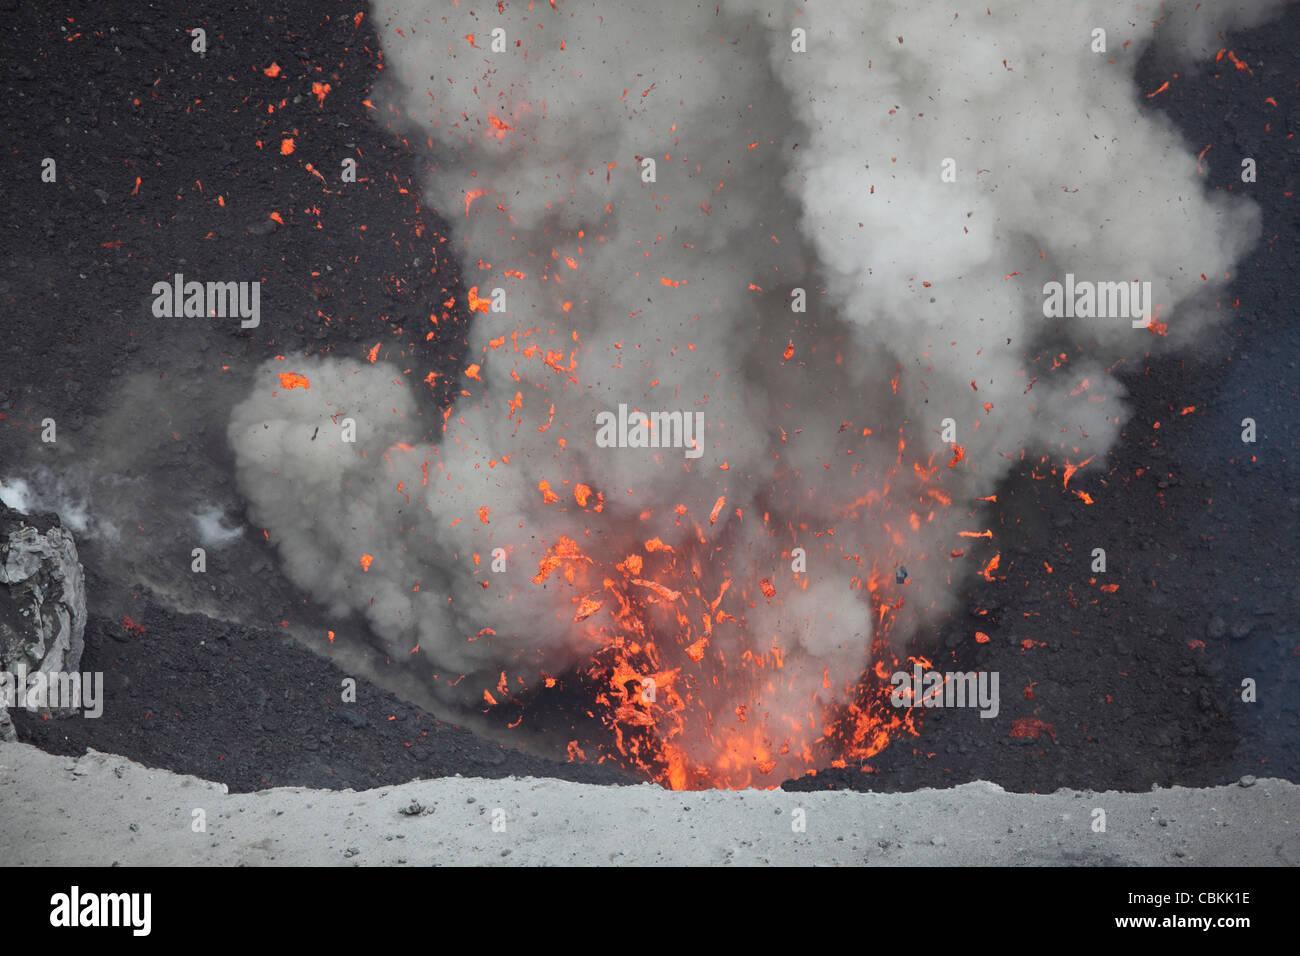 May 29, 2010 - Explosive Strombolian eruption from vent in summit crater, Yasur Volcano, Tanna Island, Vanuatu. - Stock Image